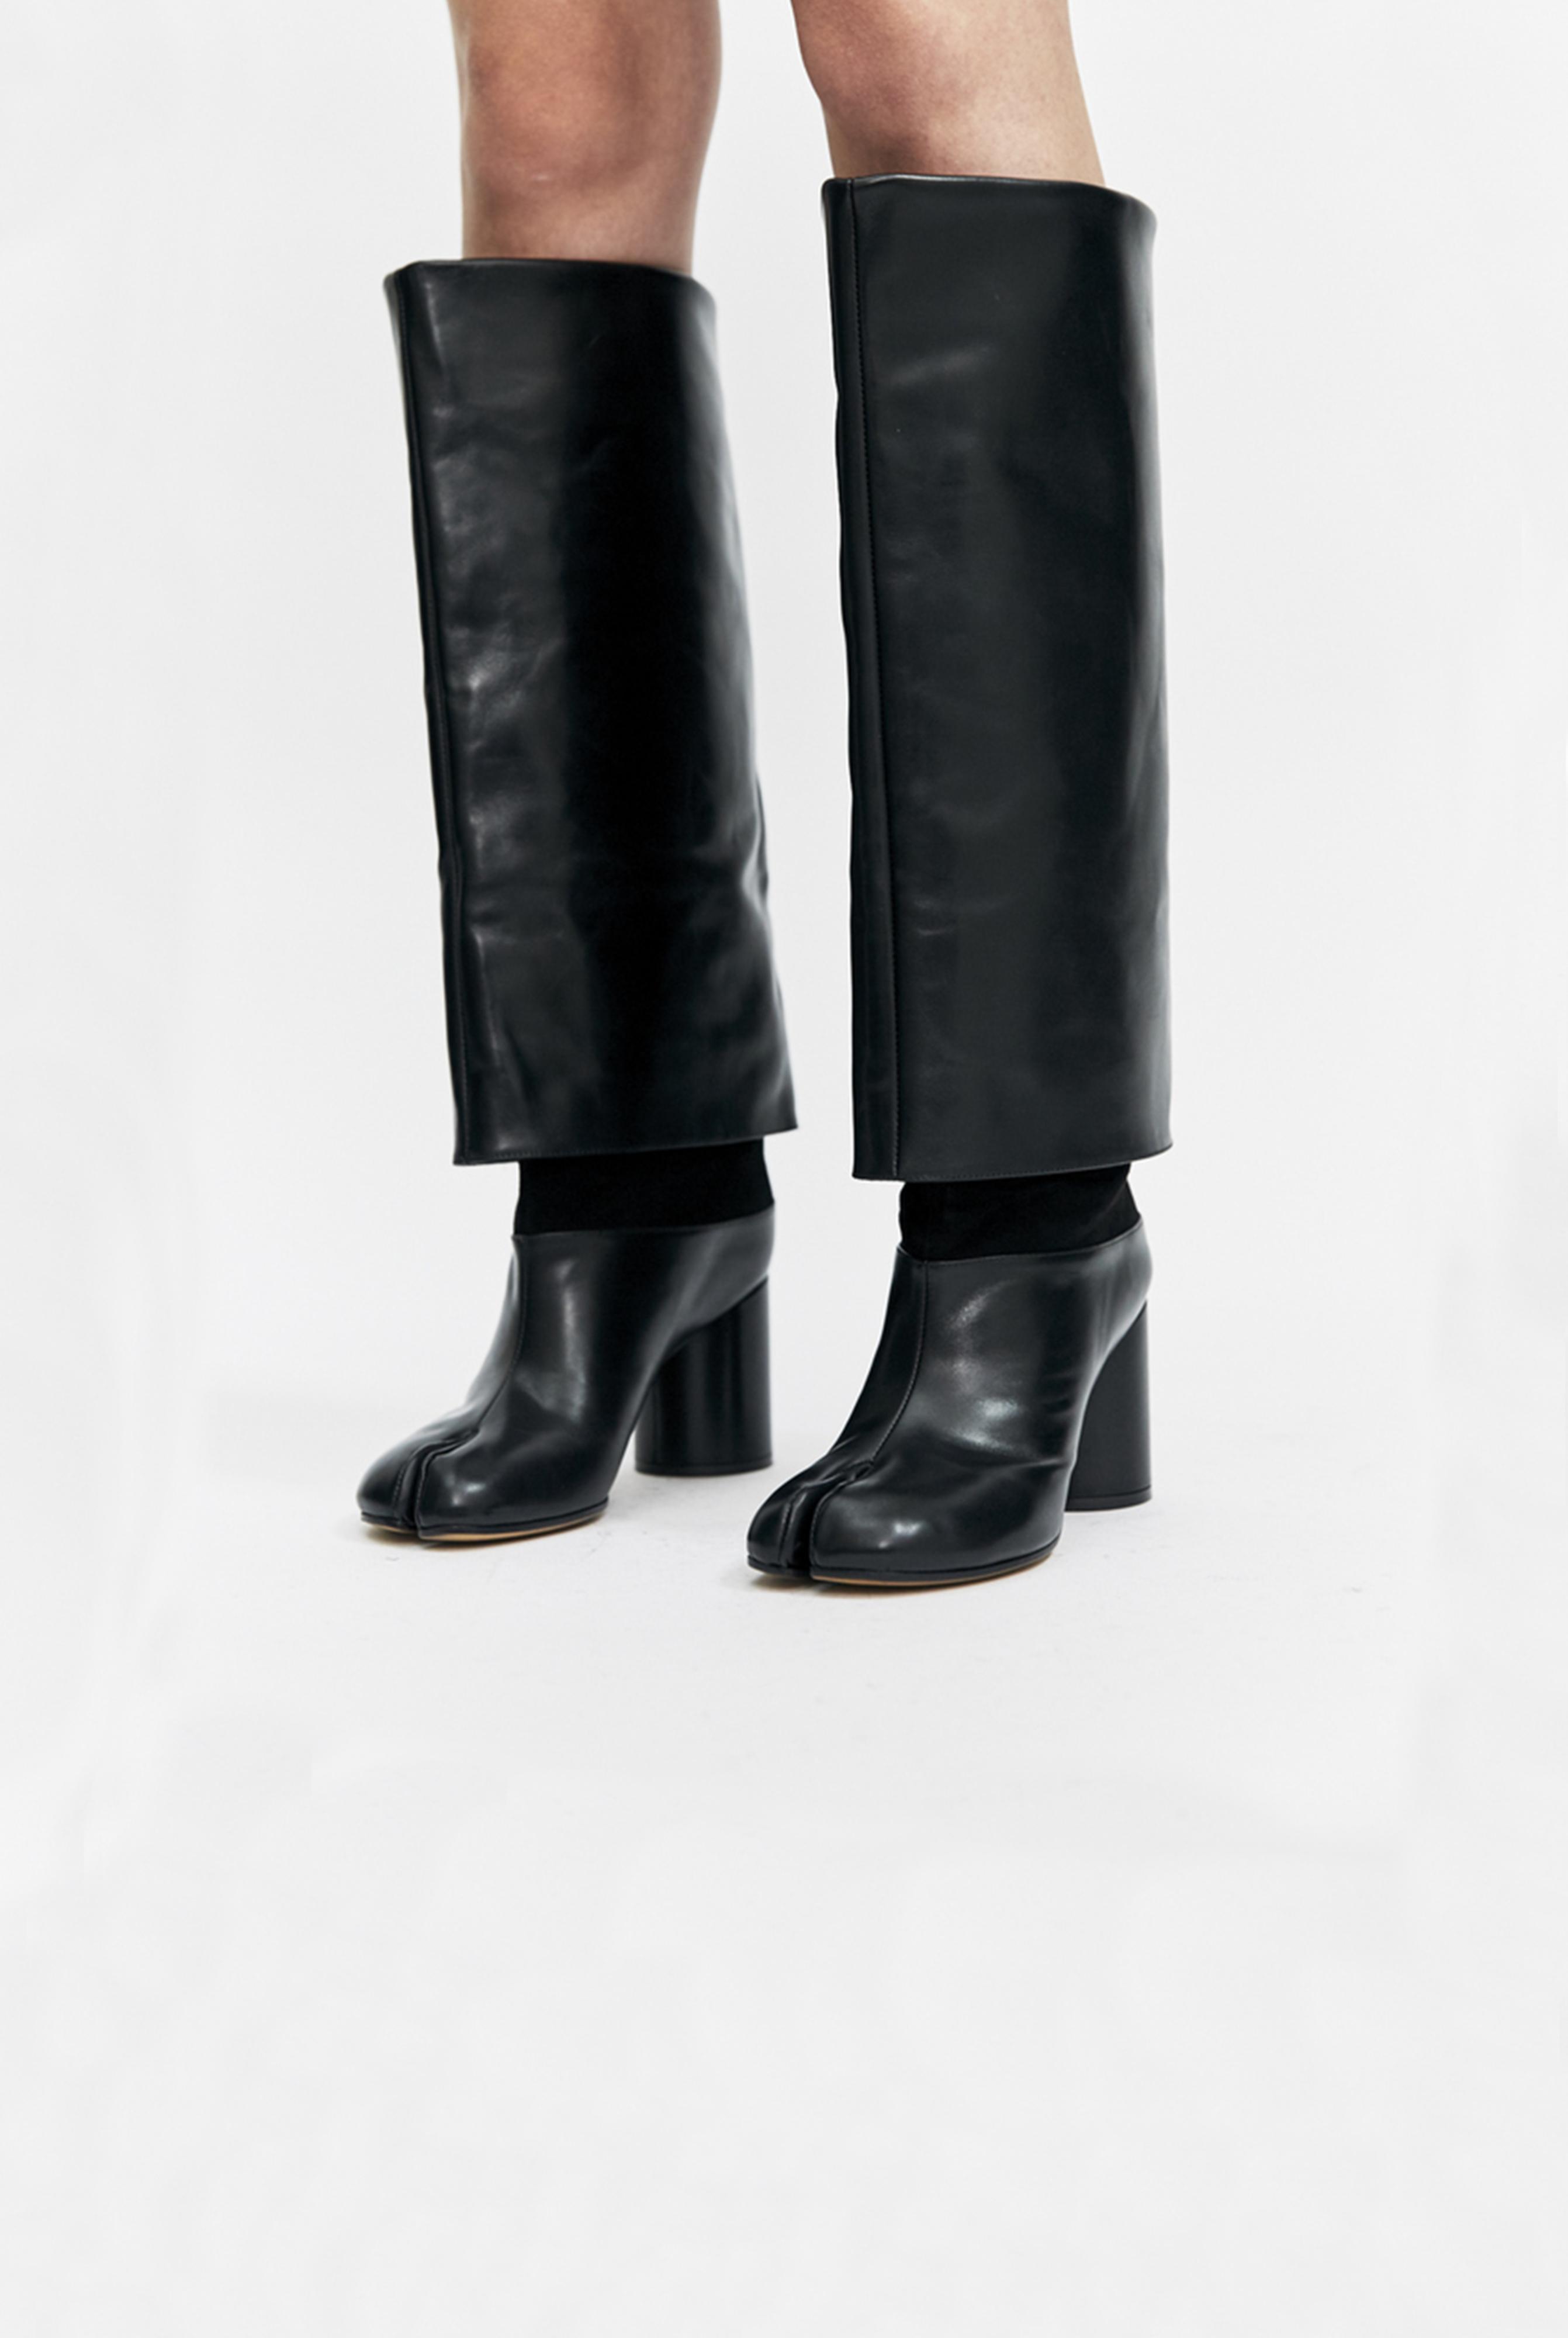 Maison Margiela oversize long Tabi boots sast cheap price visa payment cheap price buy cheap shop offer visa payment for sale I80t0sK9q